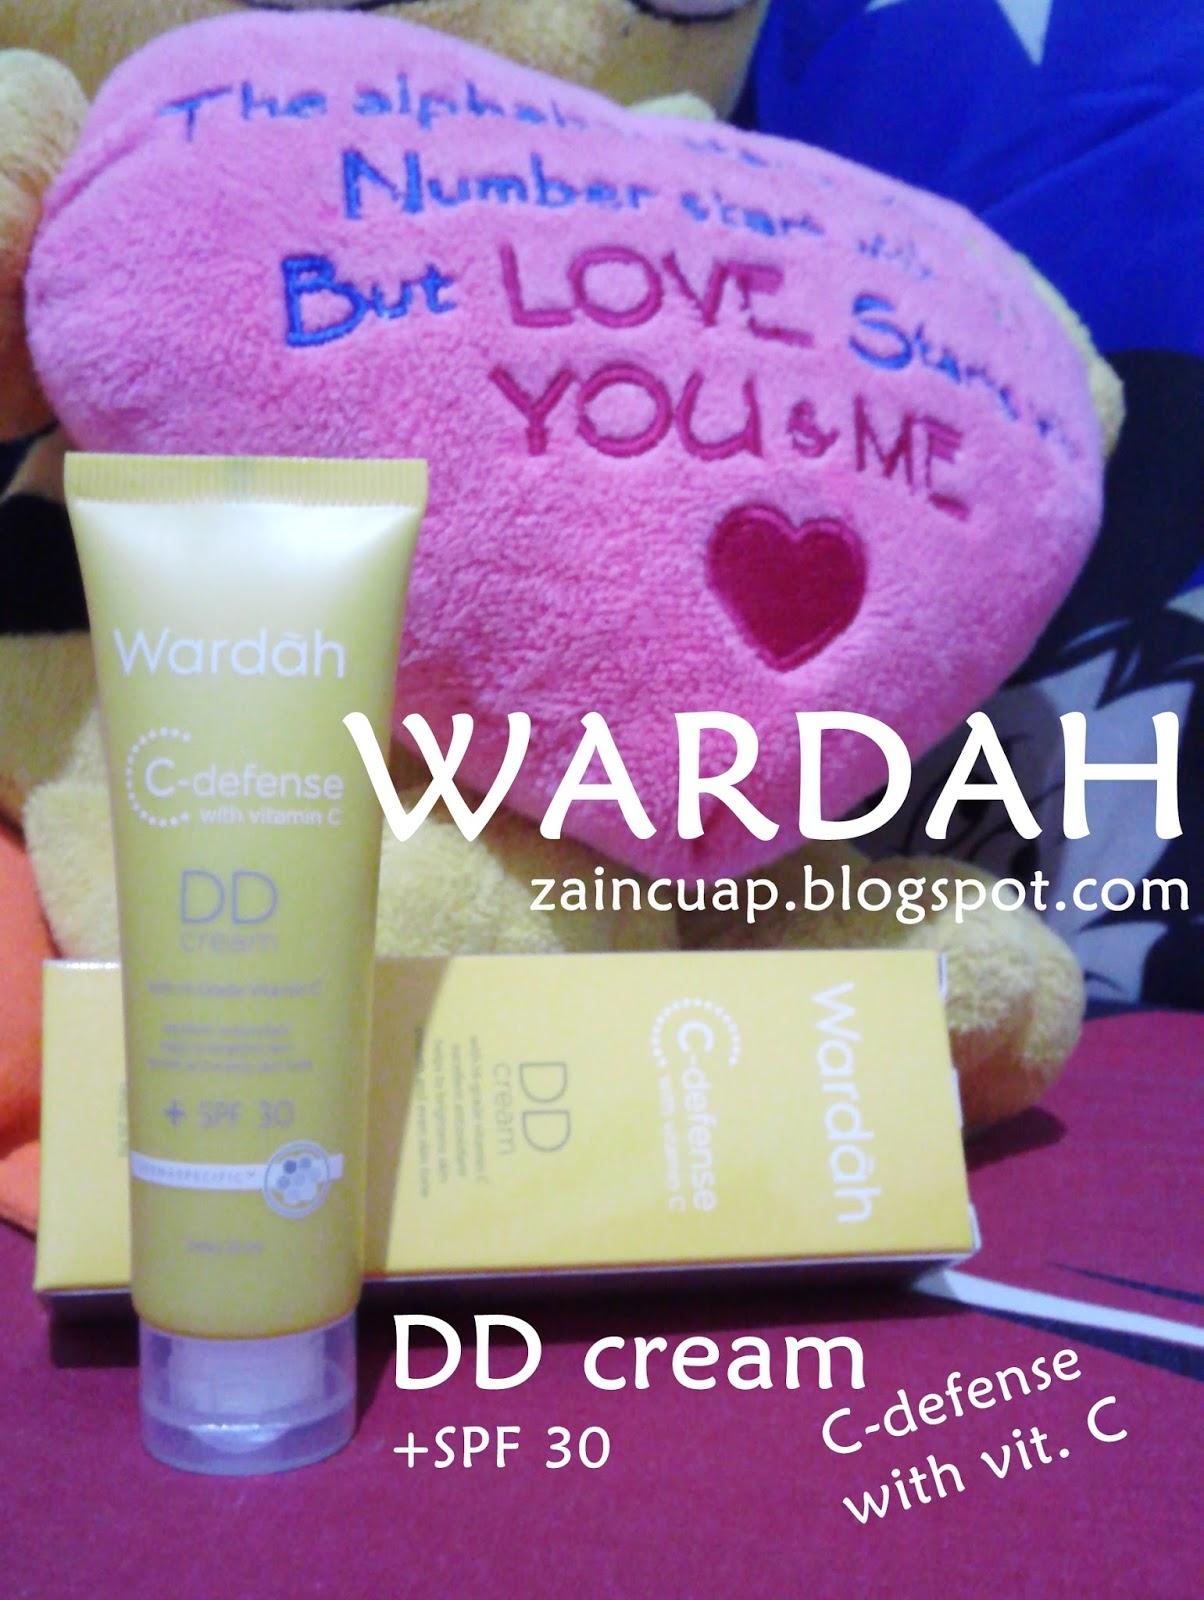 REVIEW WARDAH DD Cream C-defense with vitamin C - Cuap